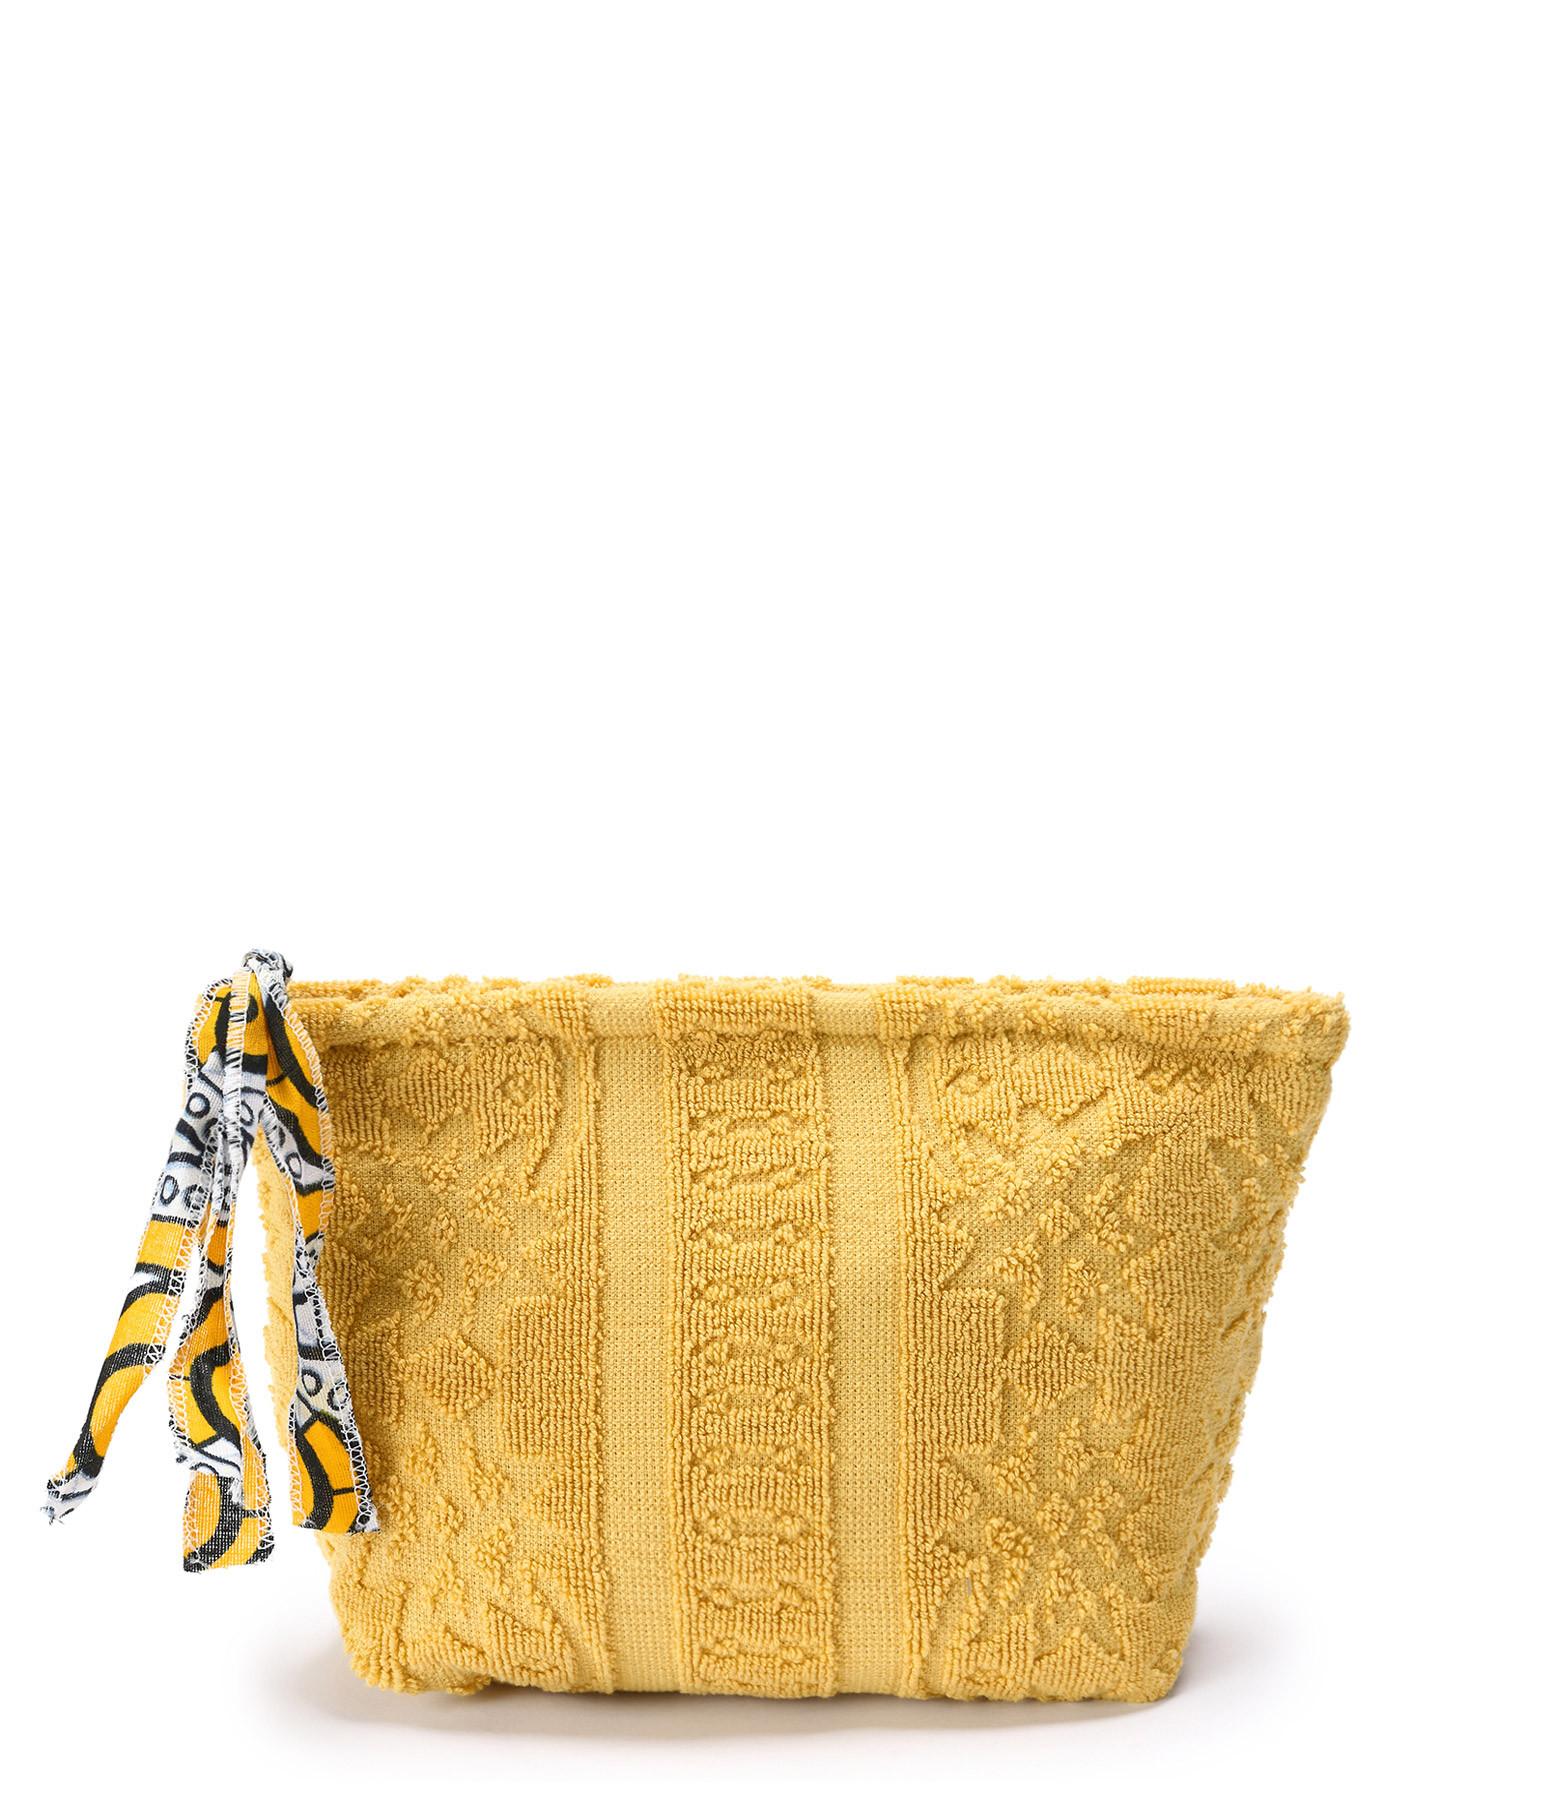 LALLA - Petite Trousse Walakin Eponge Banane